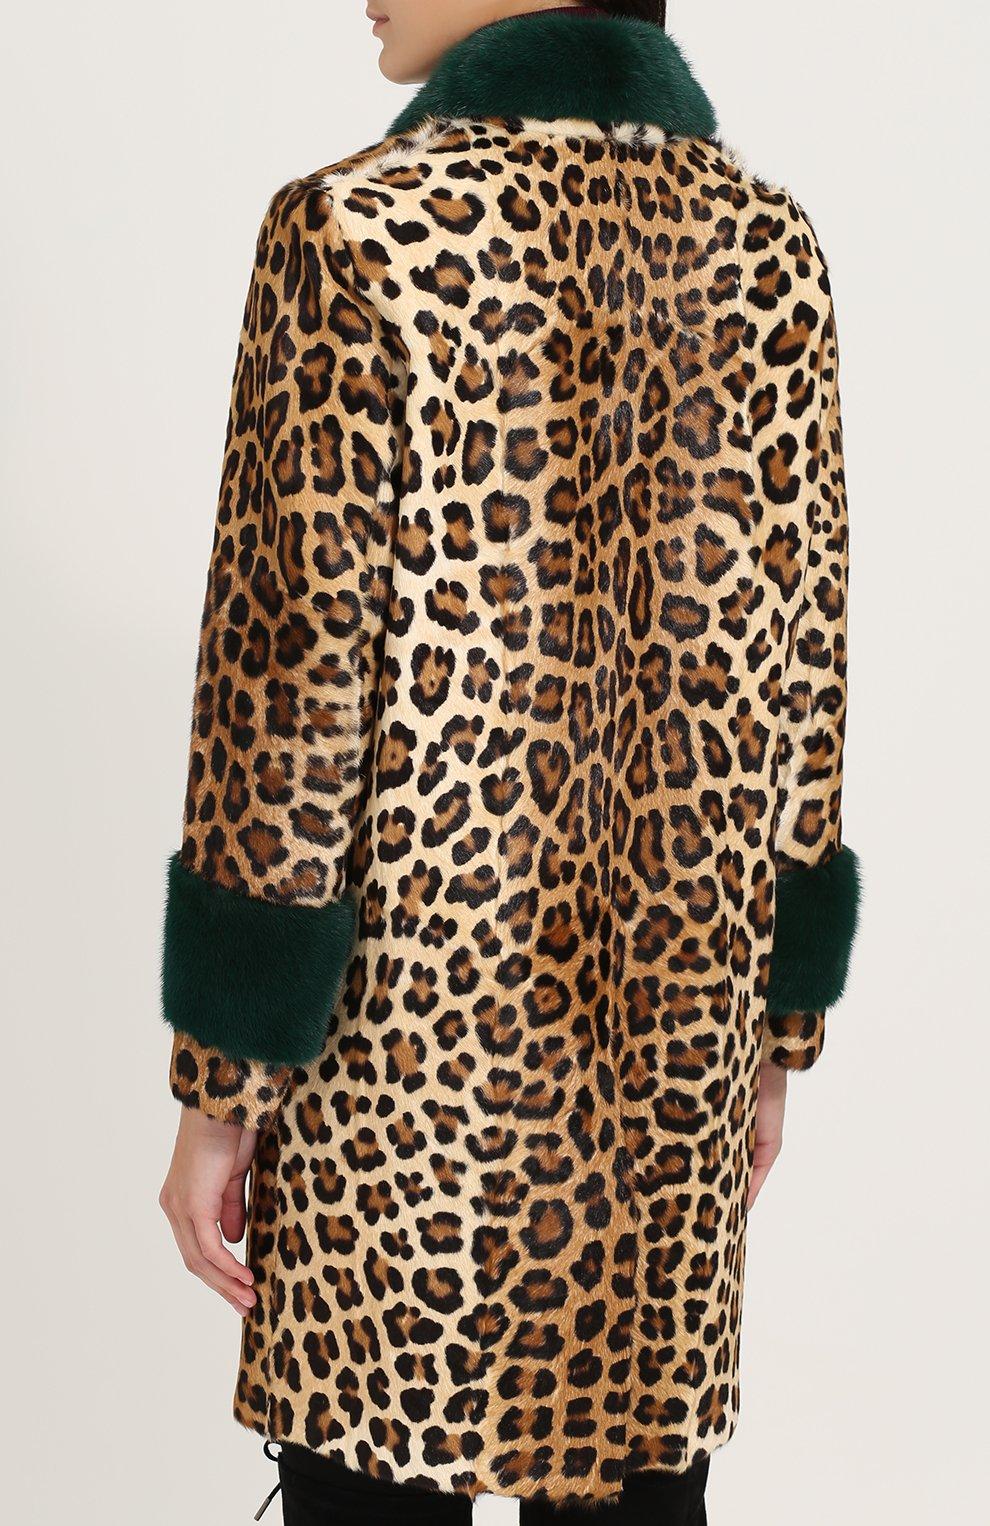 Шуба из меха норки и козлика с леопардовым принтом Simonetta Ravizza леопардовая   Фото №4